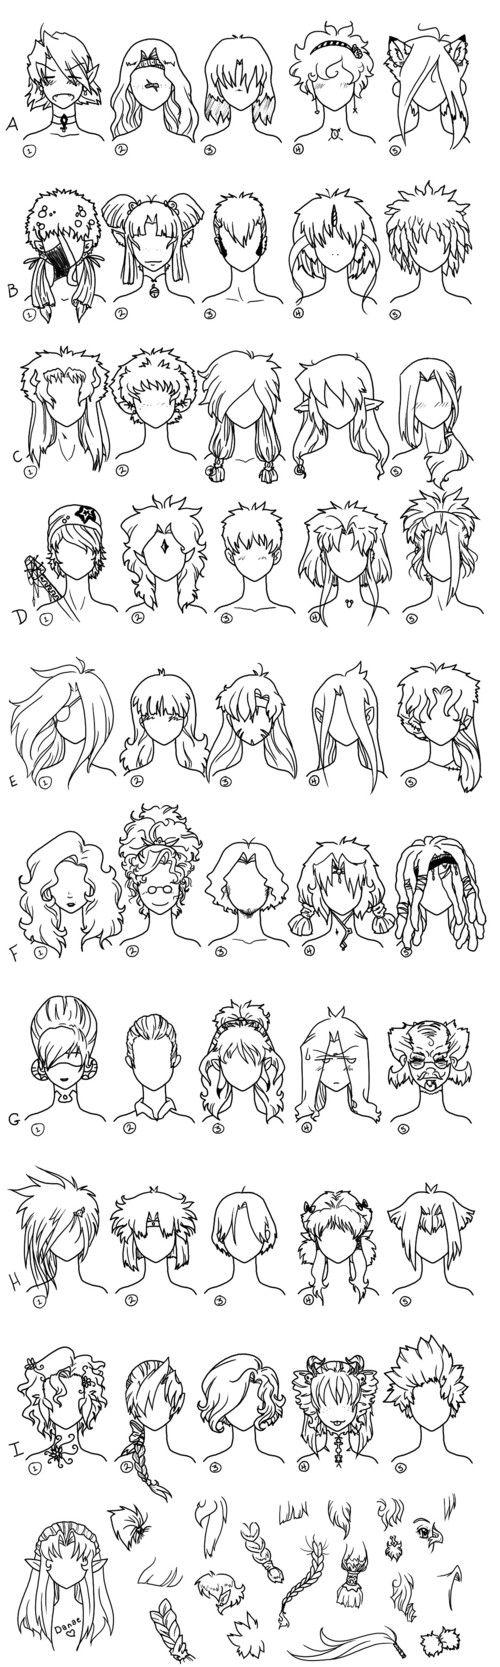 need help drawing hairstyles? here-u-go-friends!